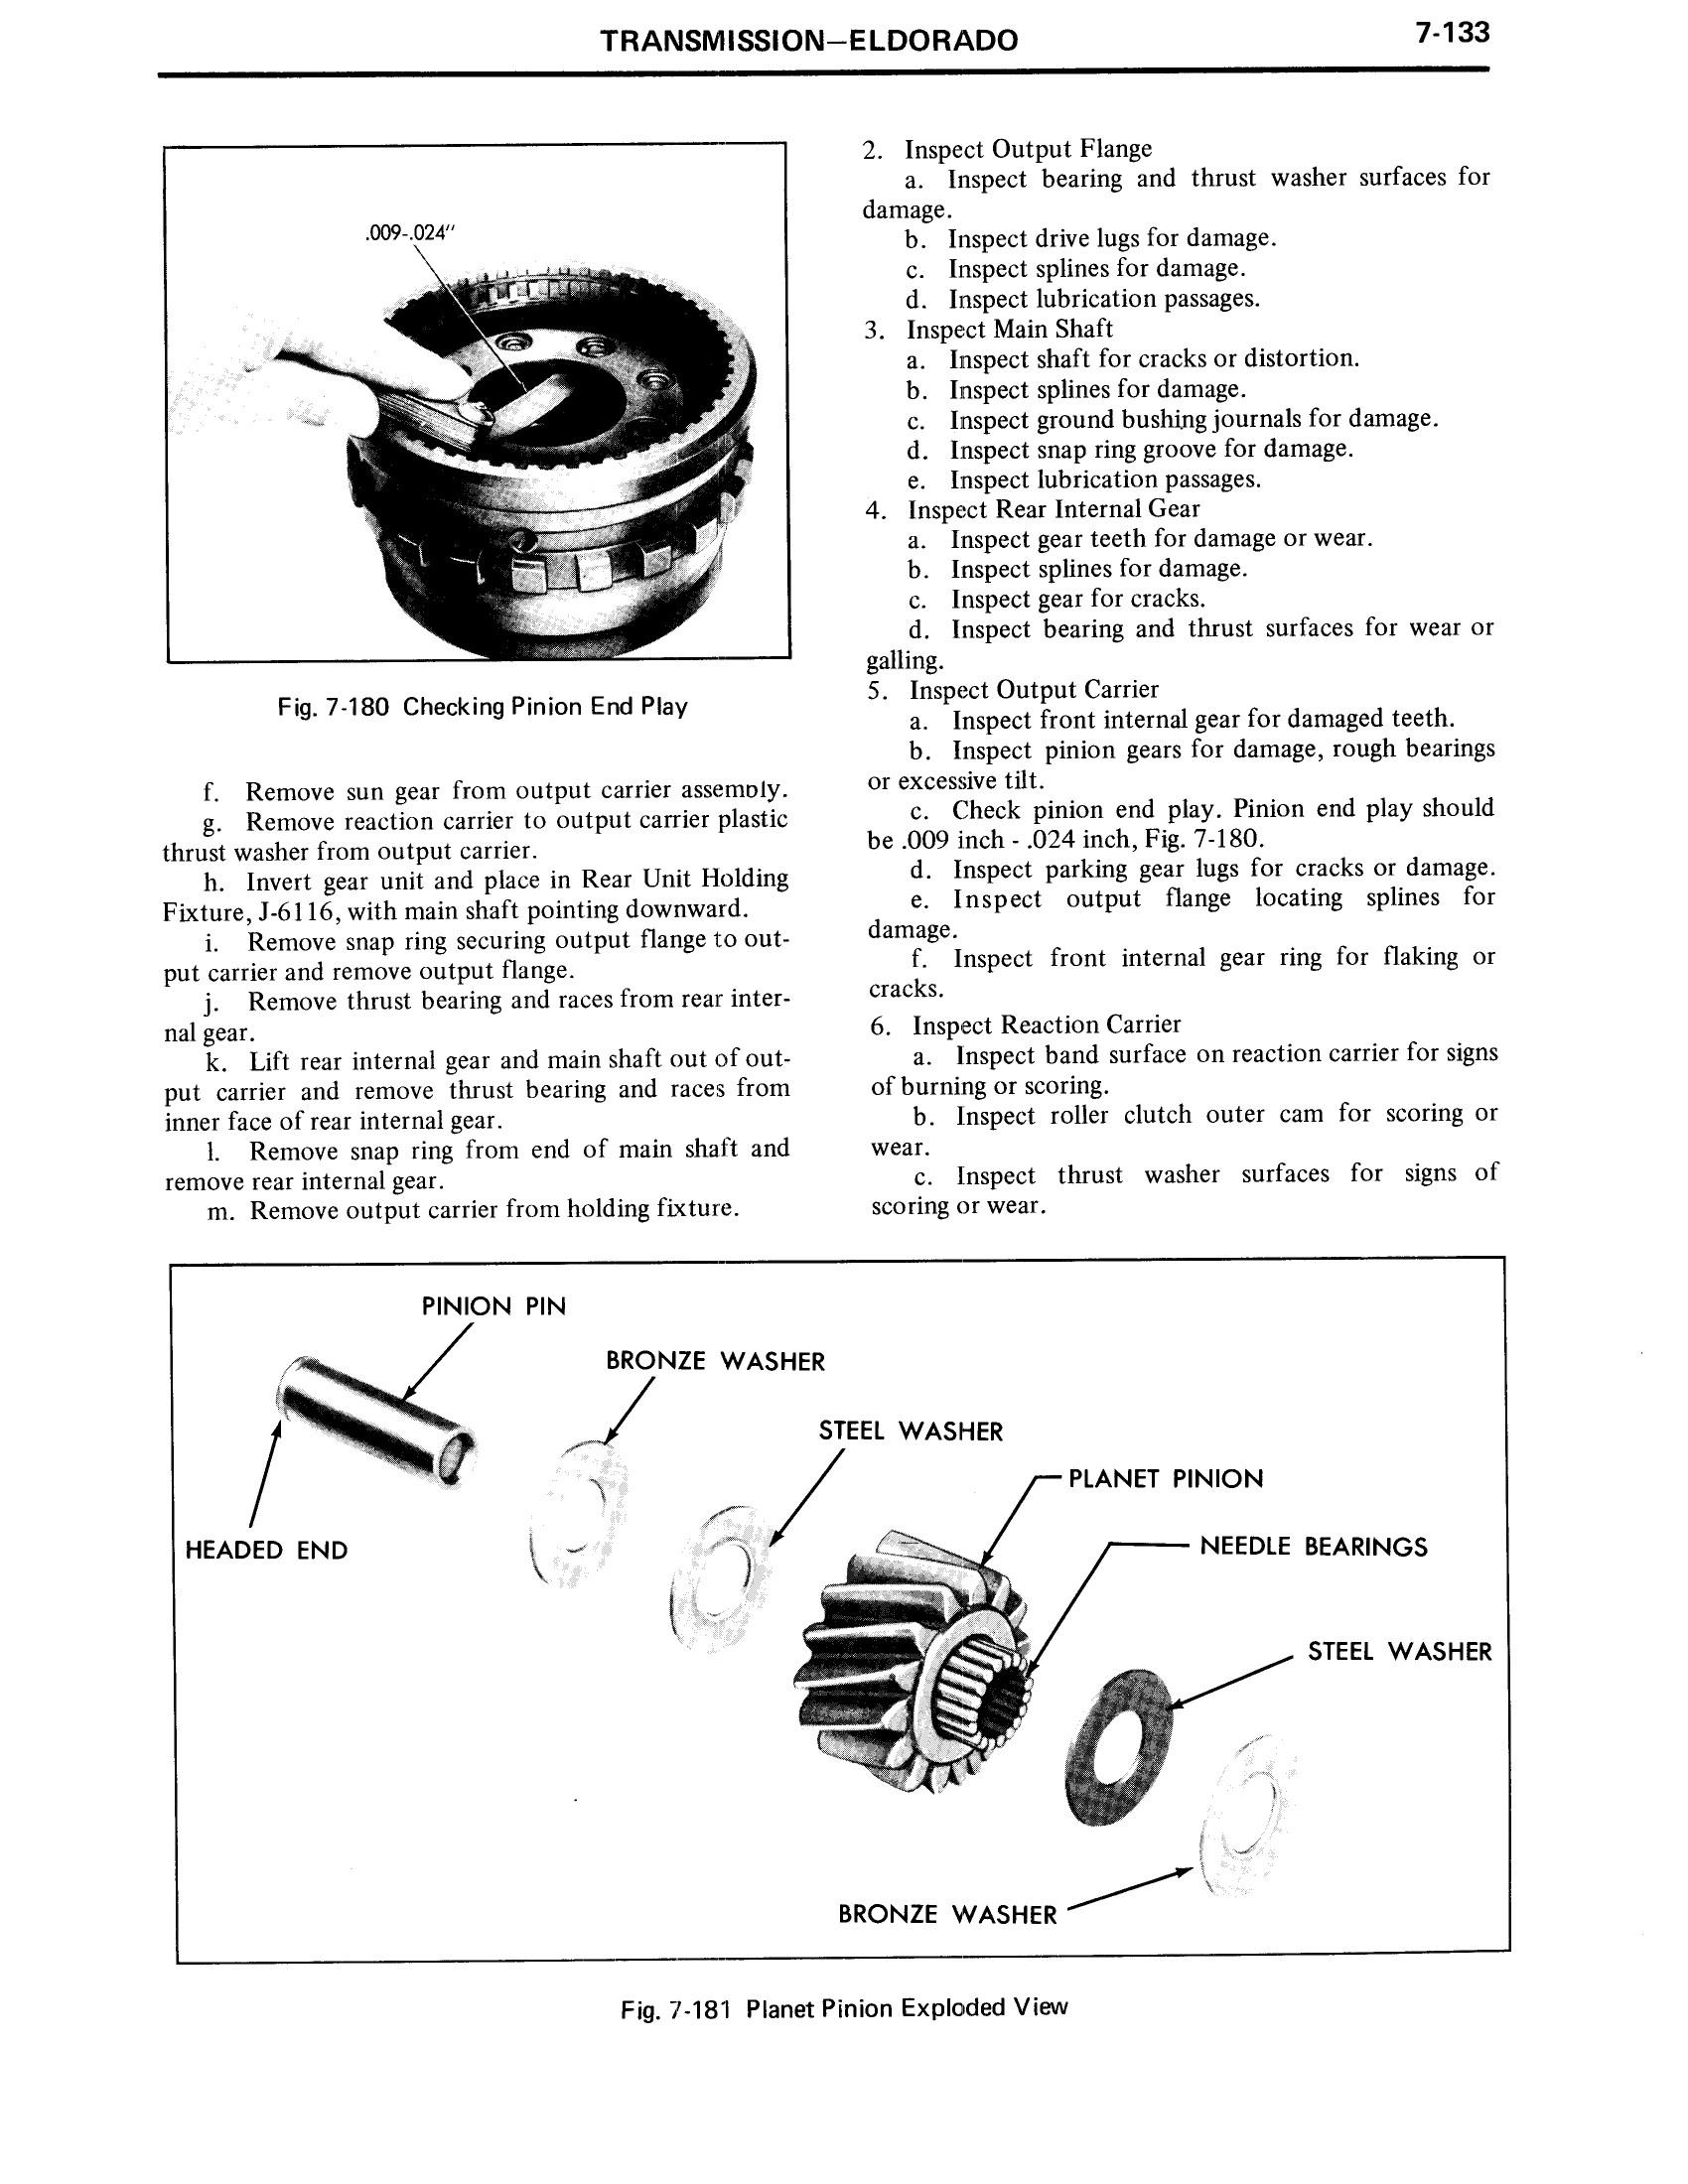 1971 Cadillac Shop Manual- Transmission Page 133 of 156